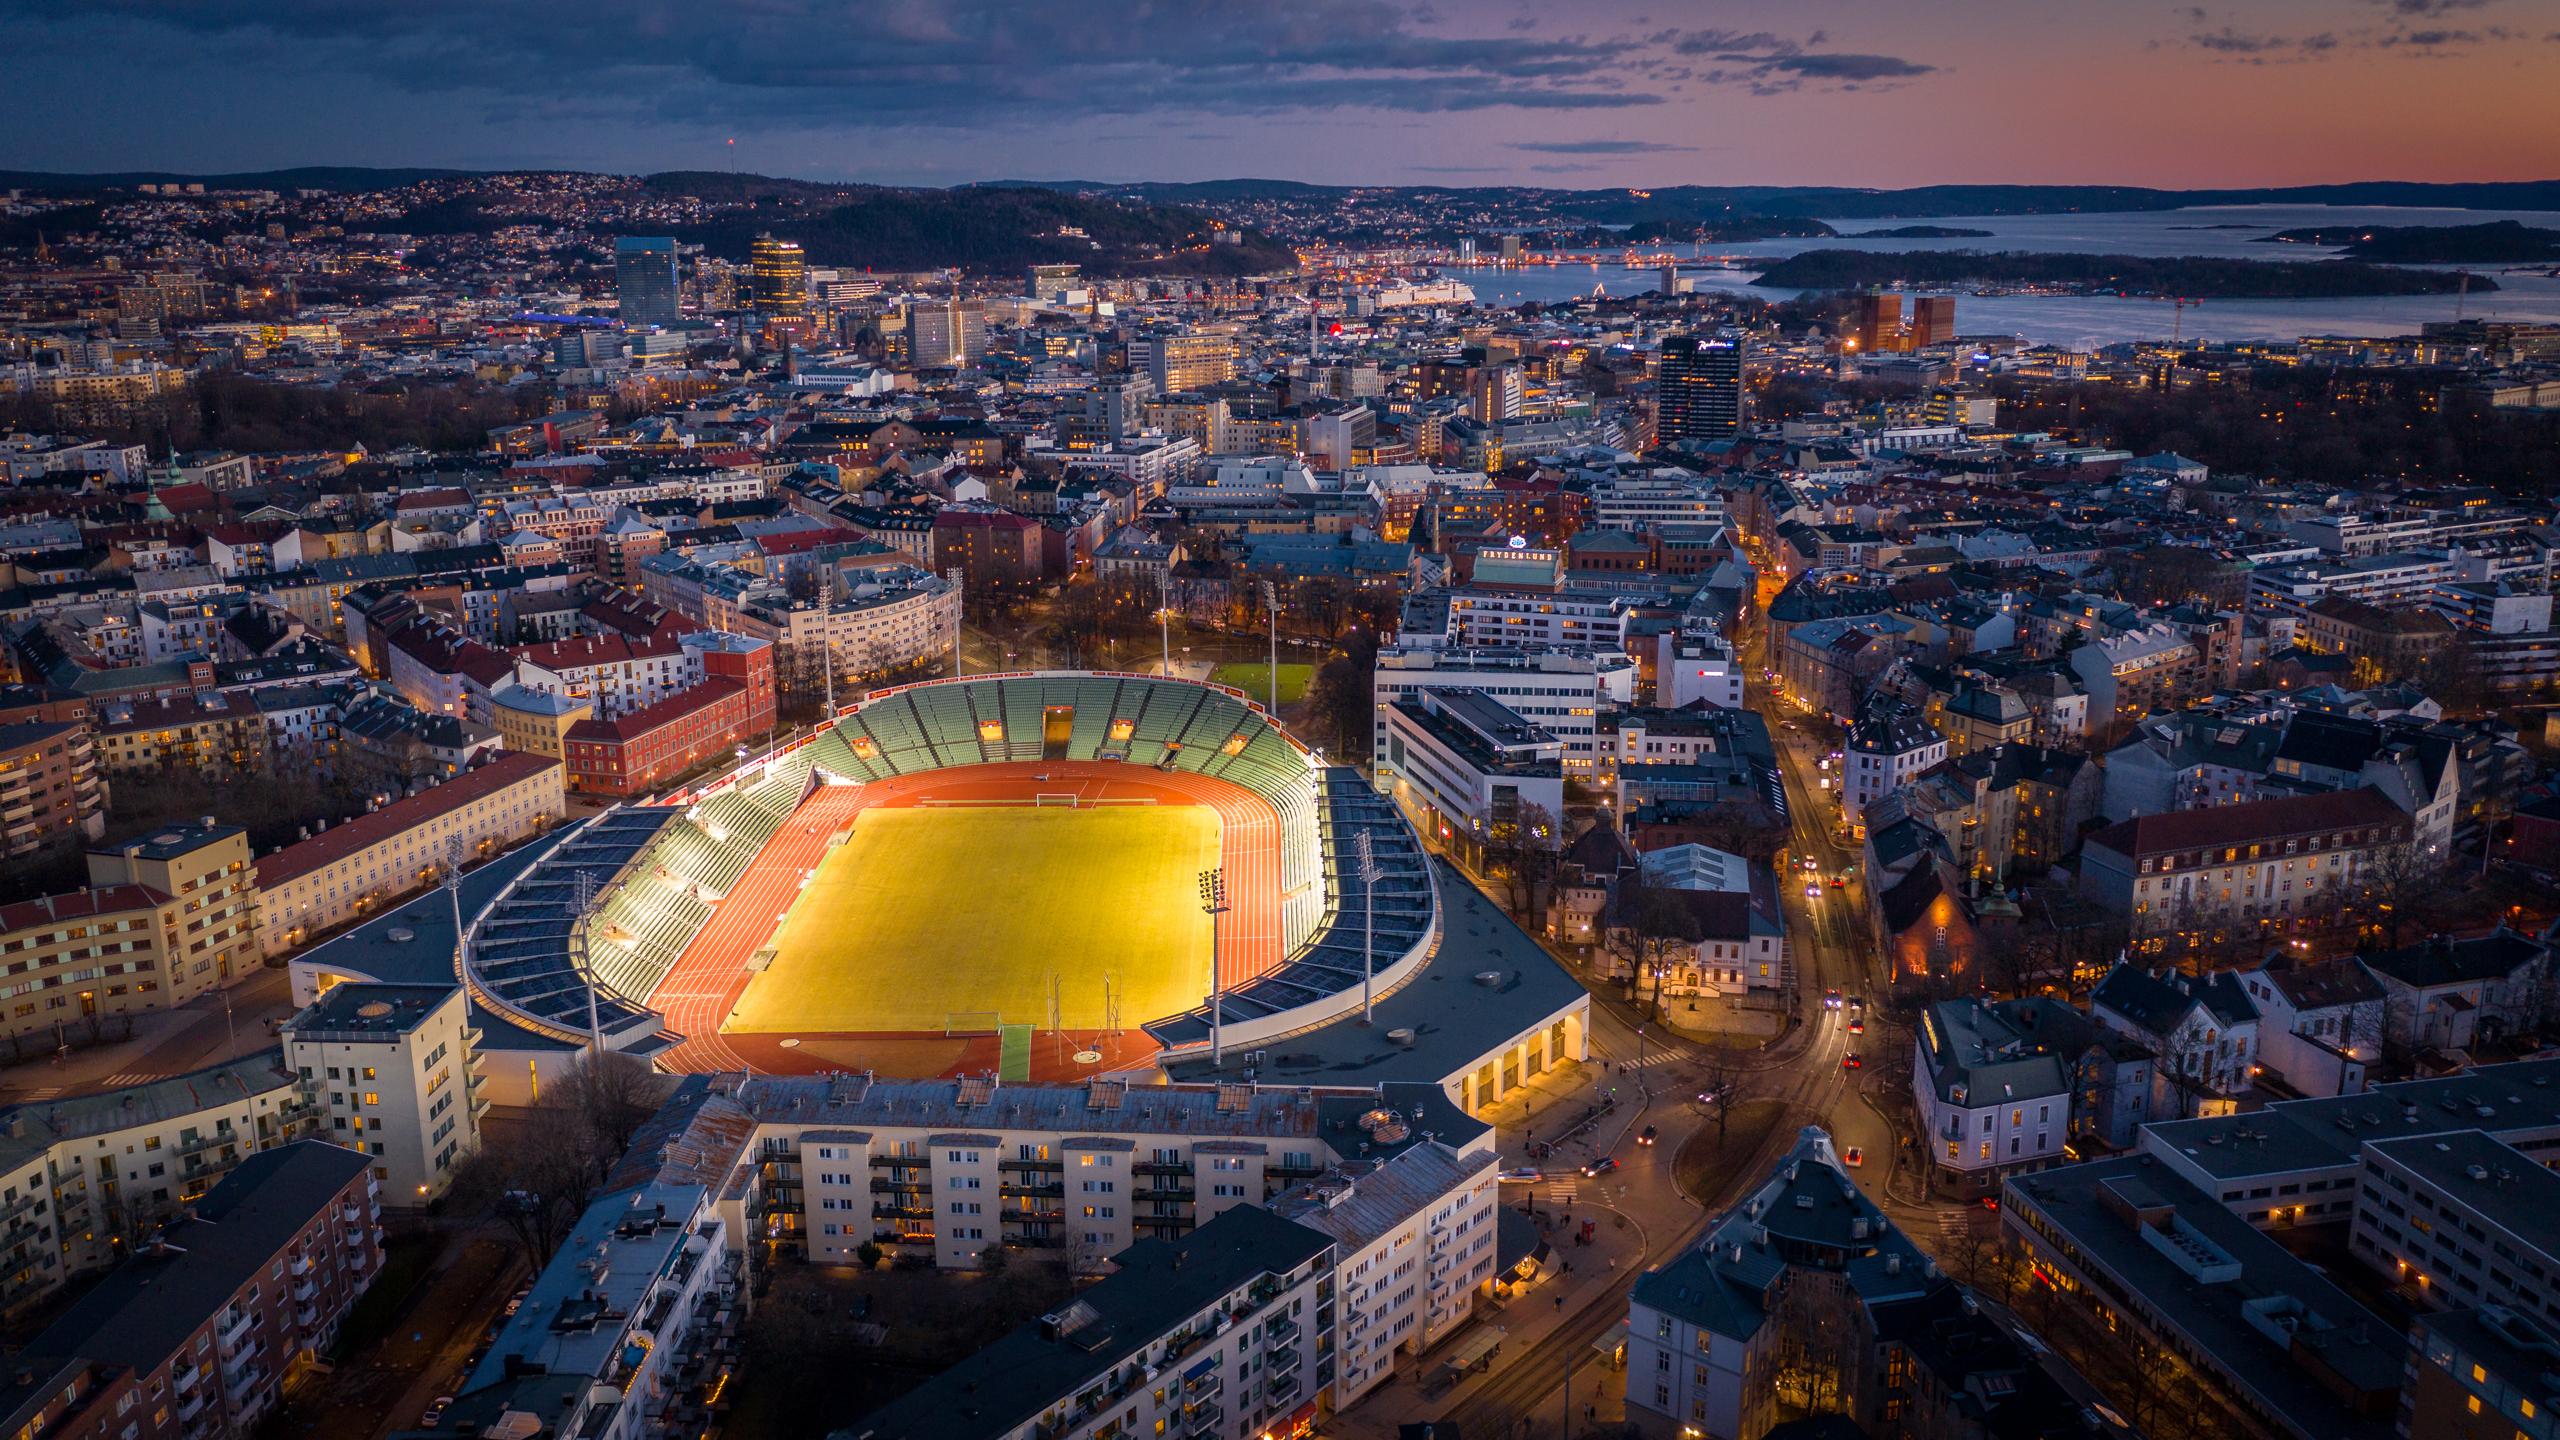 RO3 Dronefotograf i Oslo